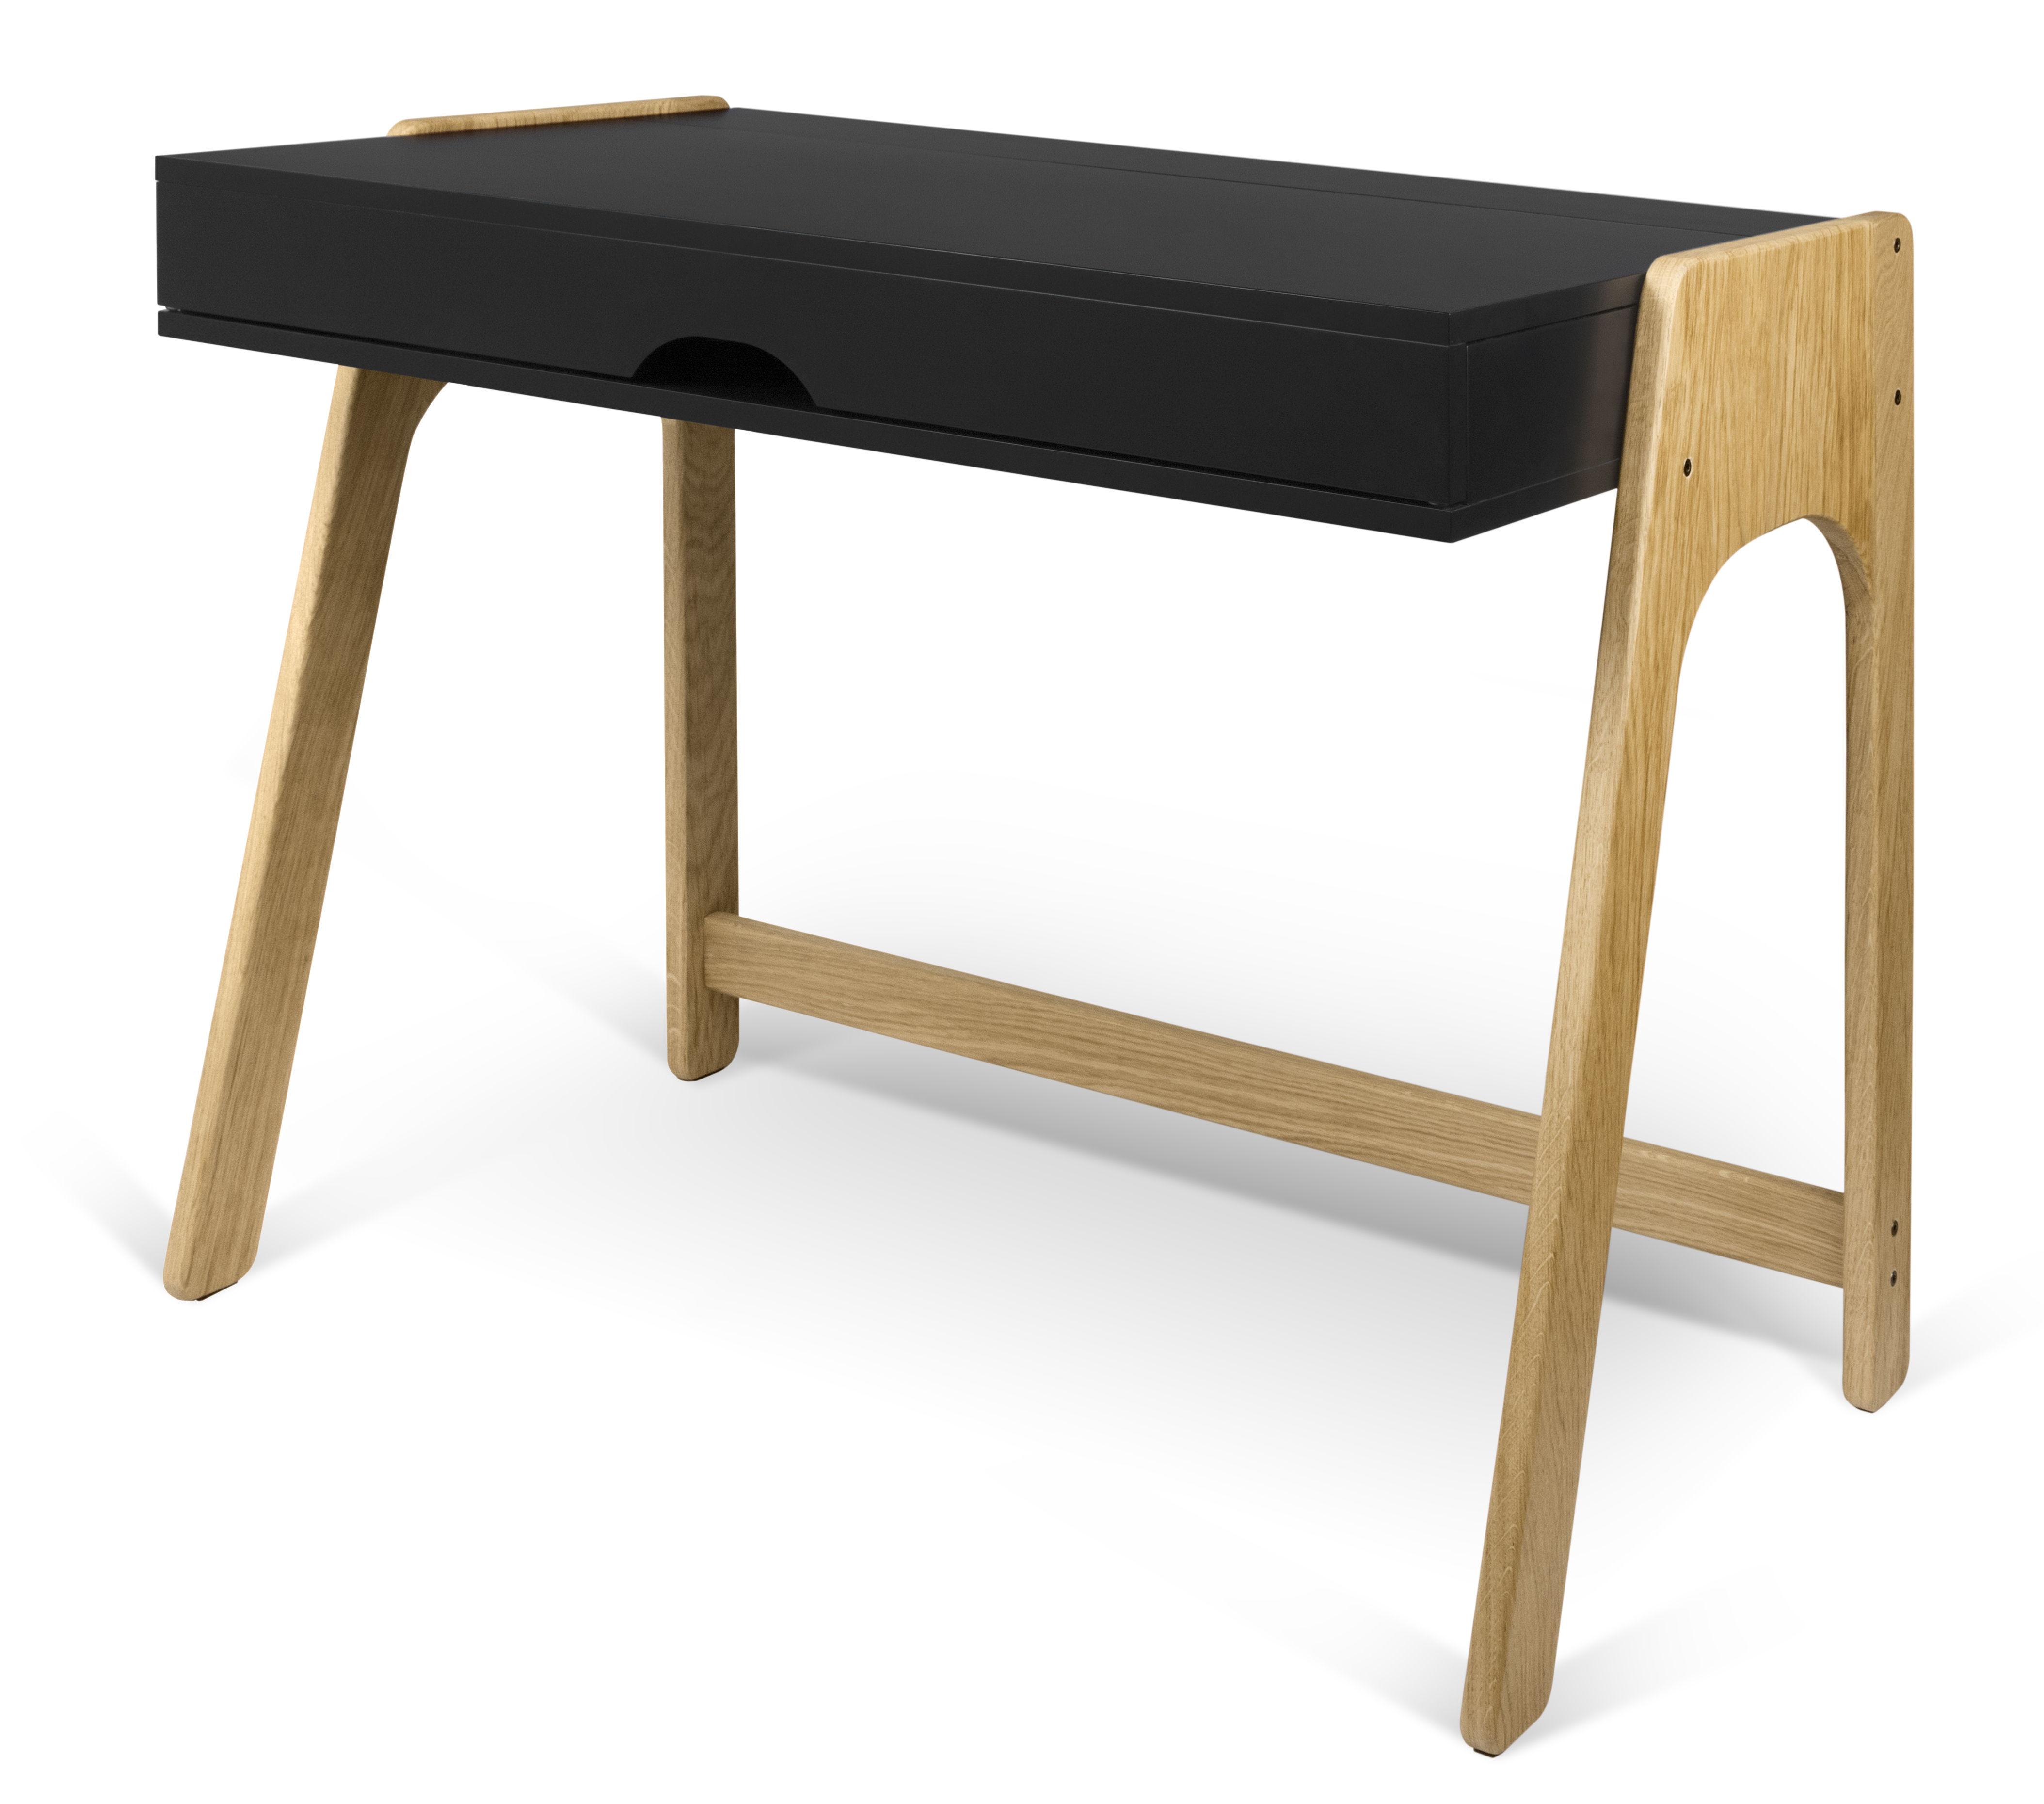 bureau willbe secr taire plateau rabattable noir ch ne pop up home. Black Bedroom Furniture Sets. Home Design Ideas